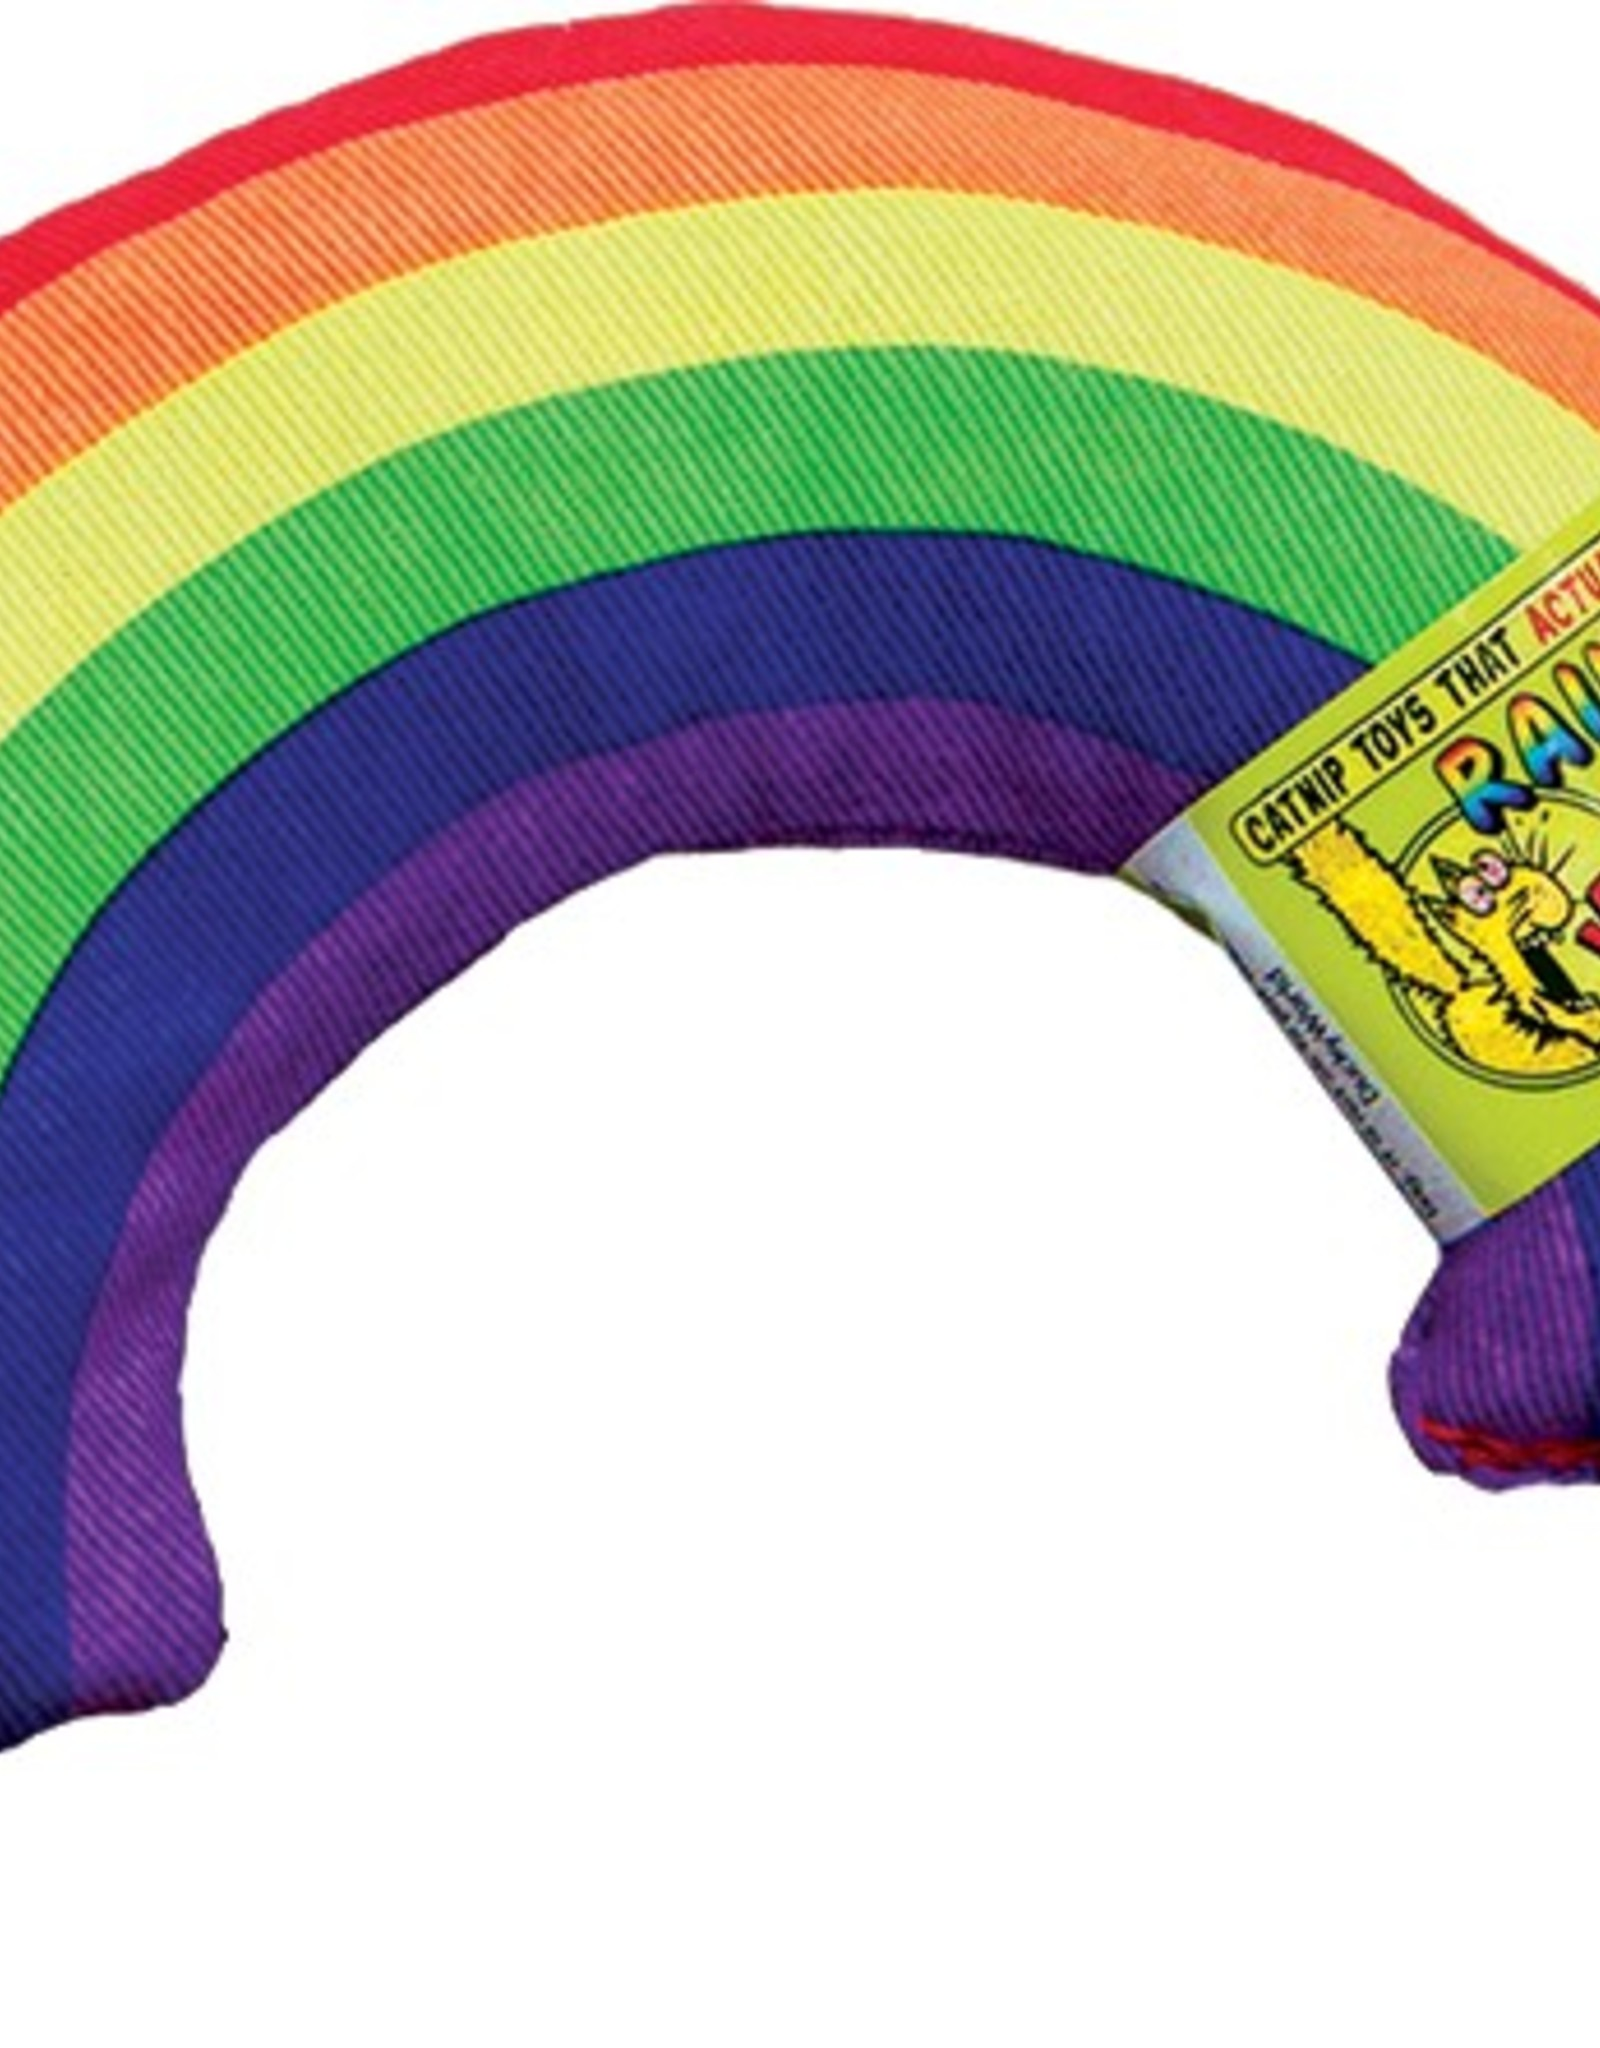 Ducky World Yeowww! Rainbow